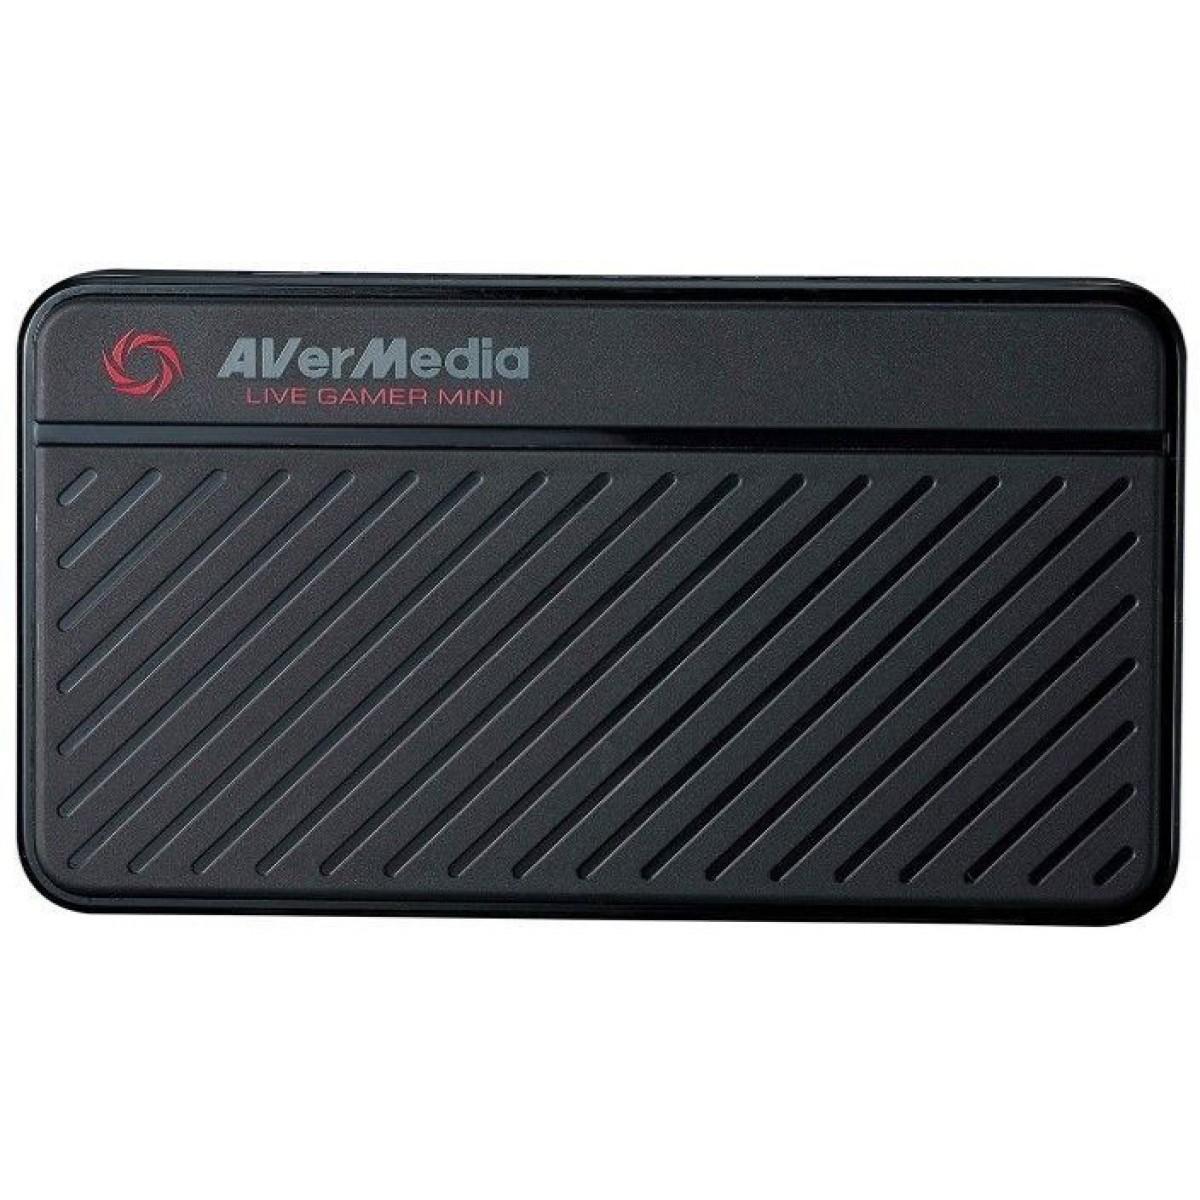 Placa de Captura Avermedia Live Gamer Mini, Interface USB 2.0, GC311